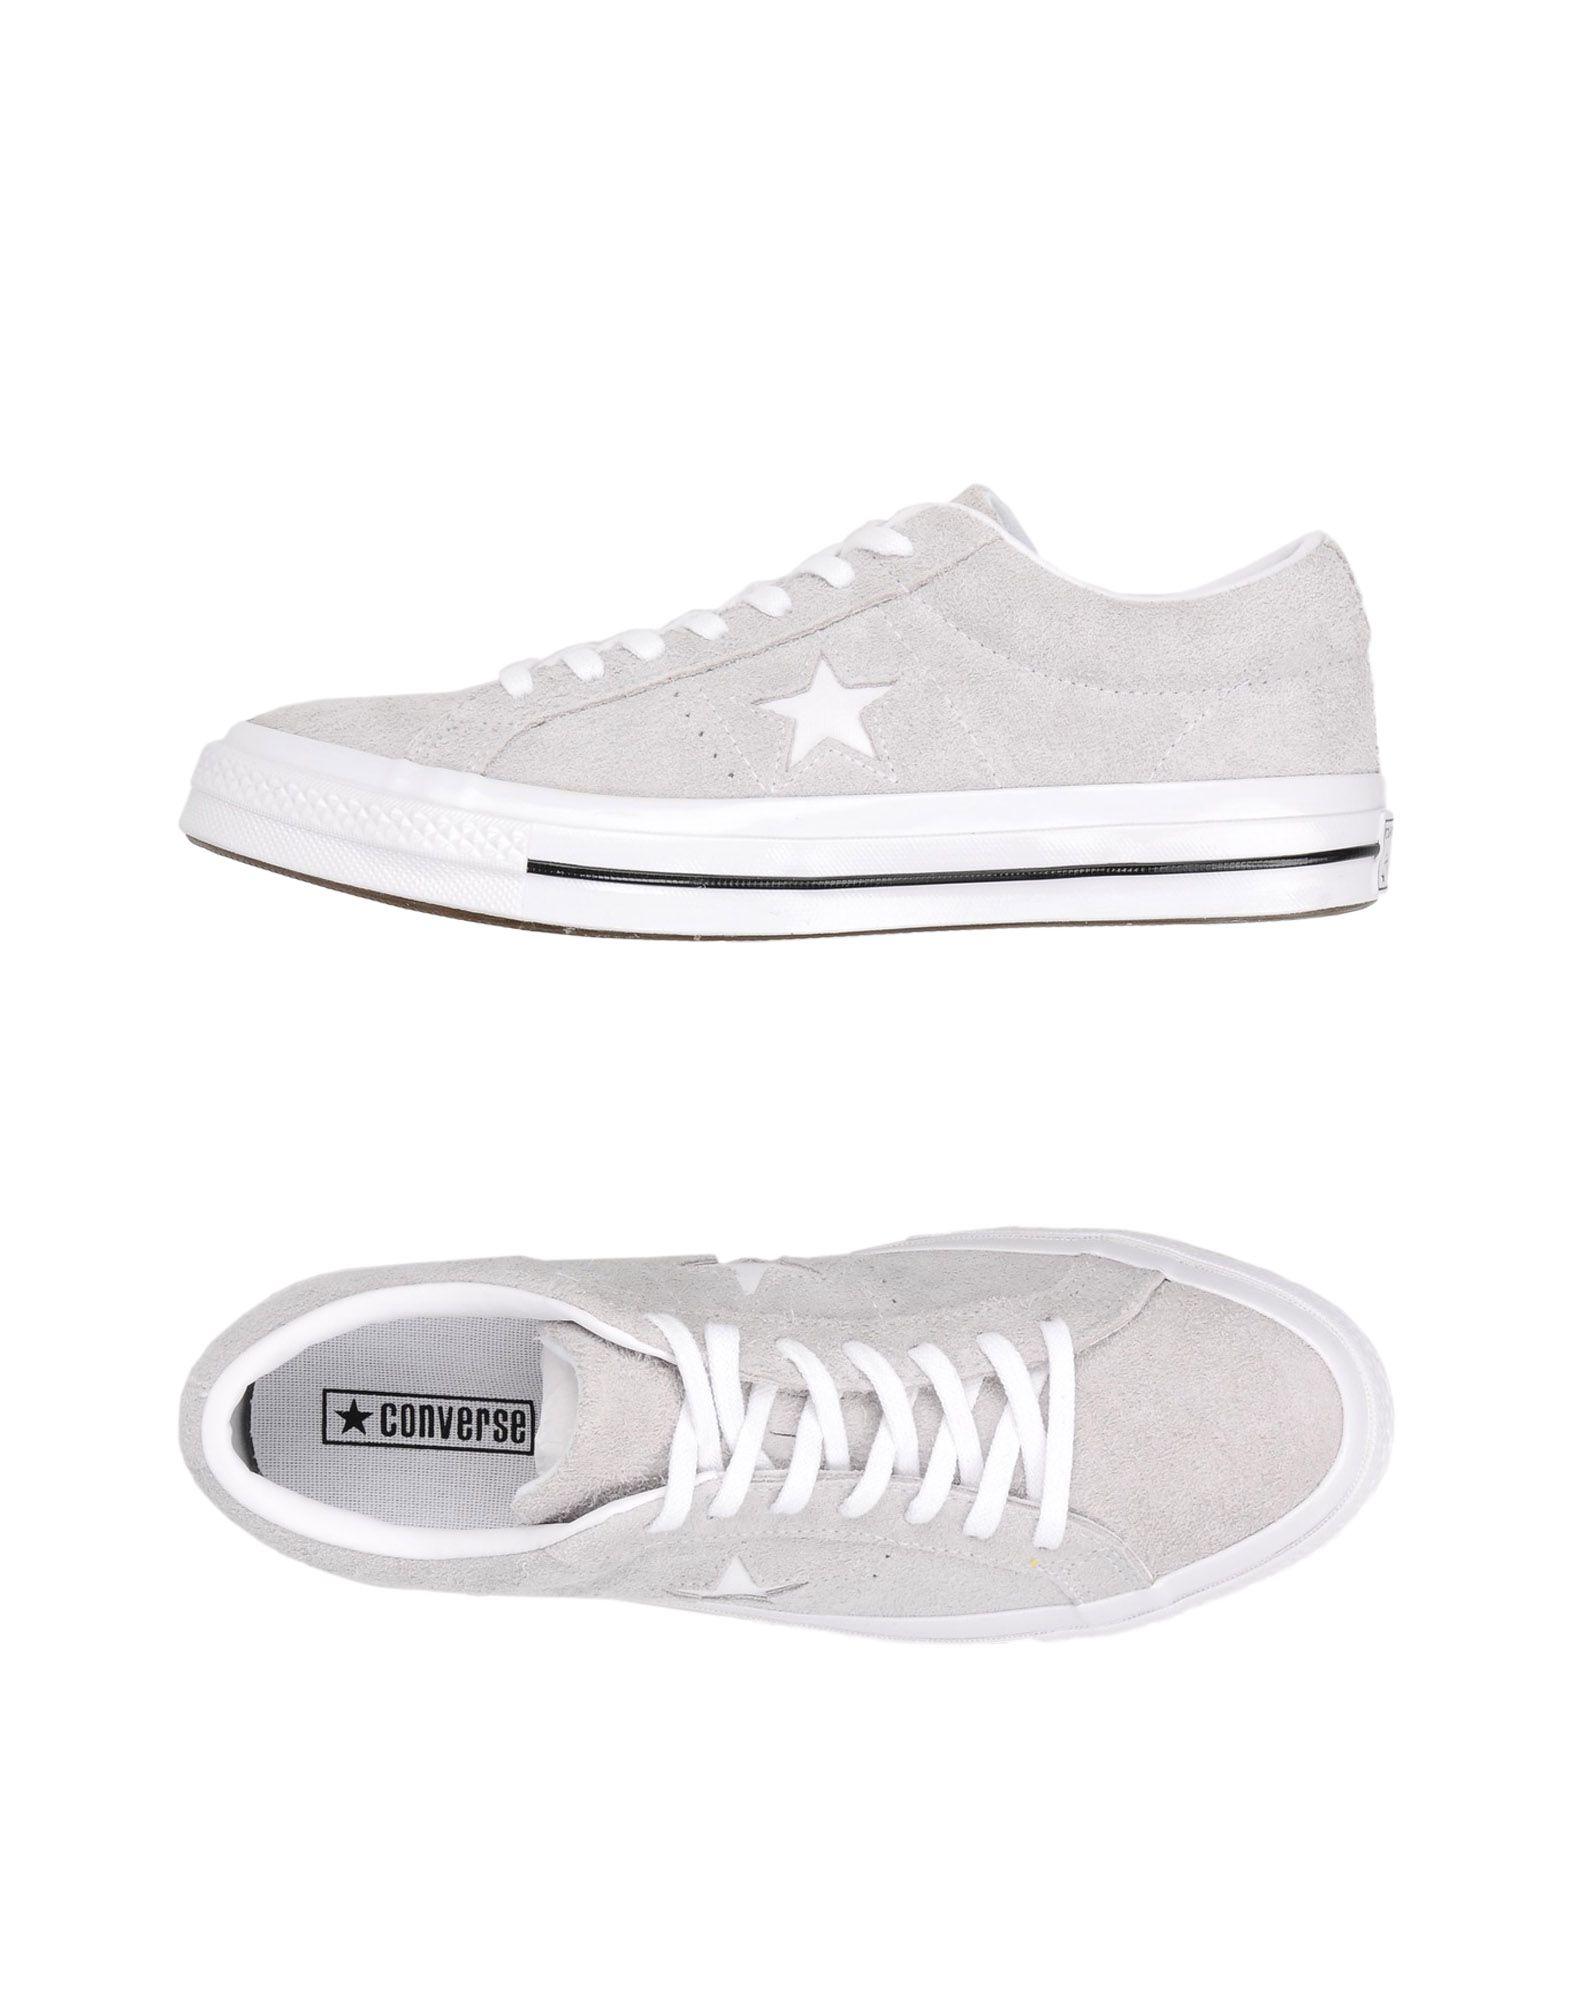 Scarpe Star da Ginnastica Converse All Star Scarpe One Star Ox Og Suede - Uomo - 11445677AF 766531